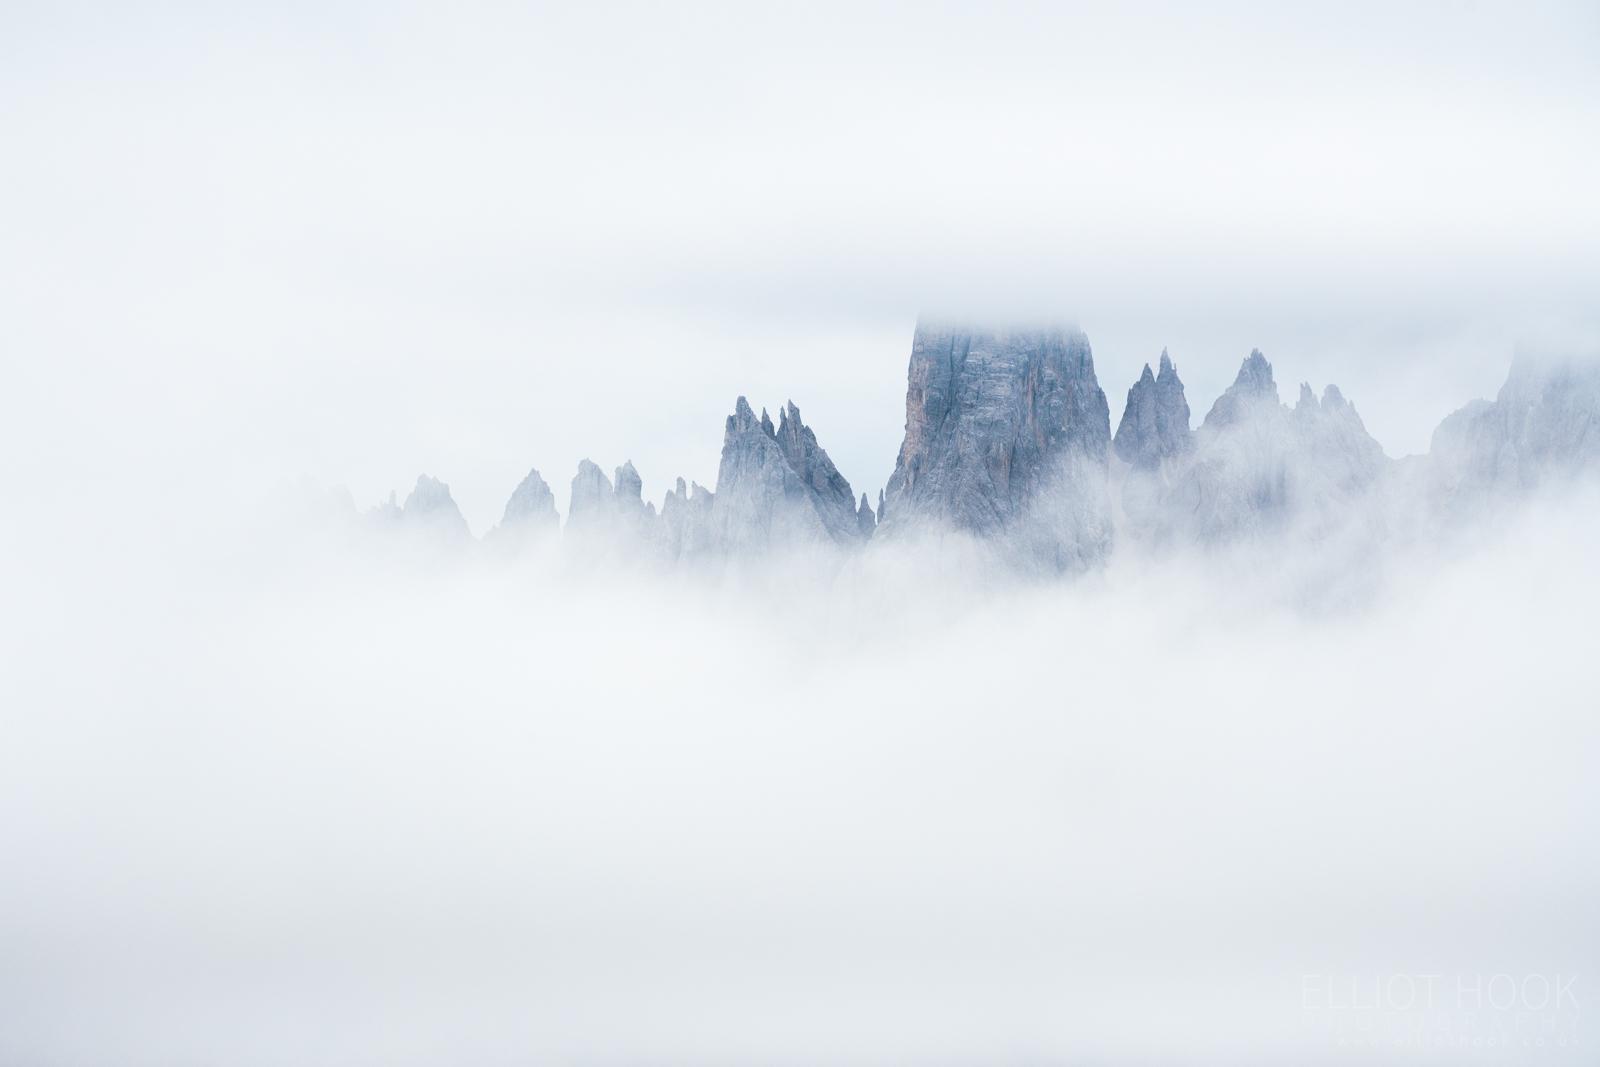 Dolomites - Cima Cadin di San Lucano in low cloud